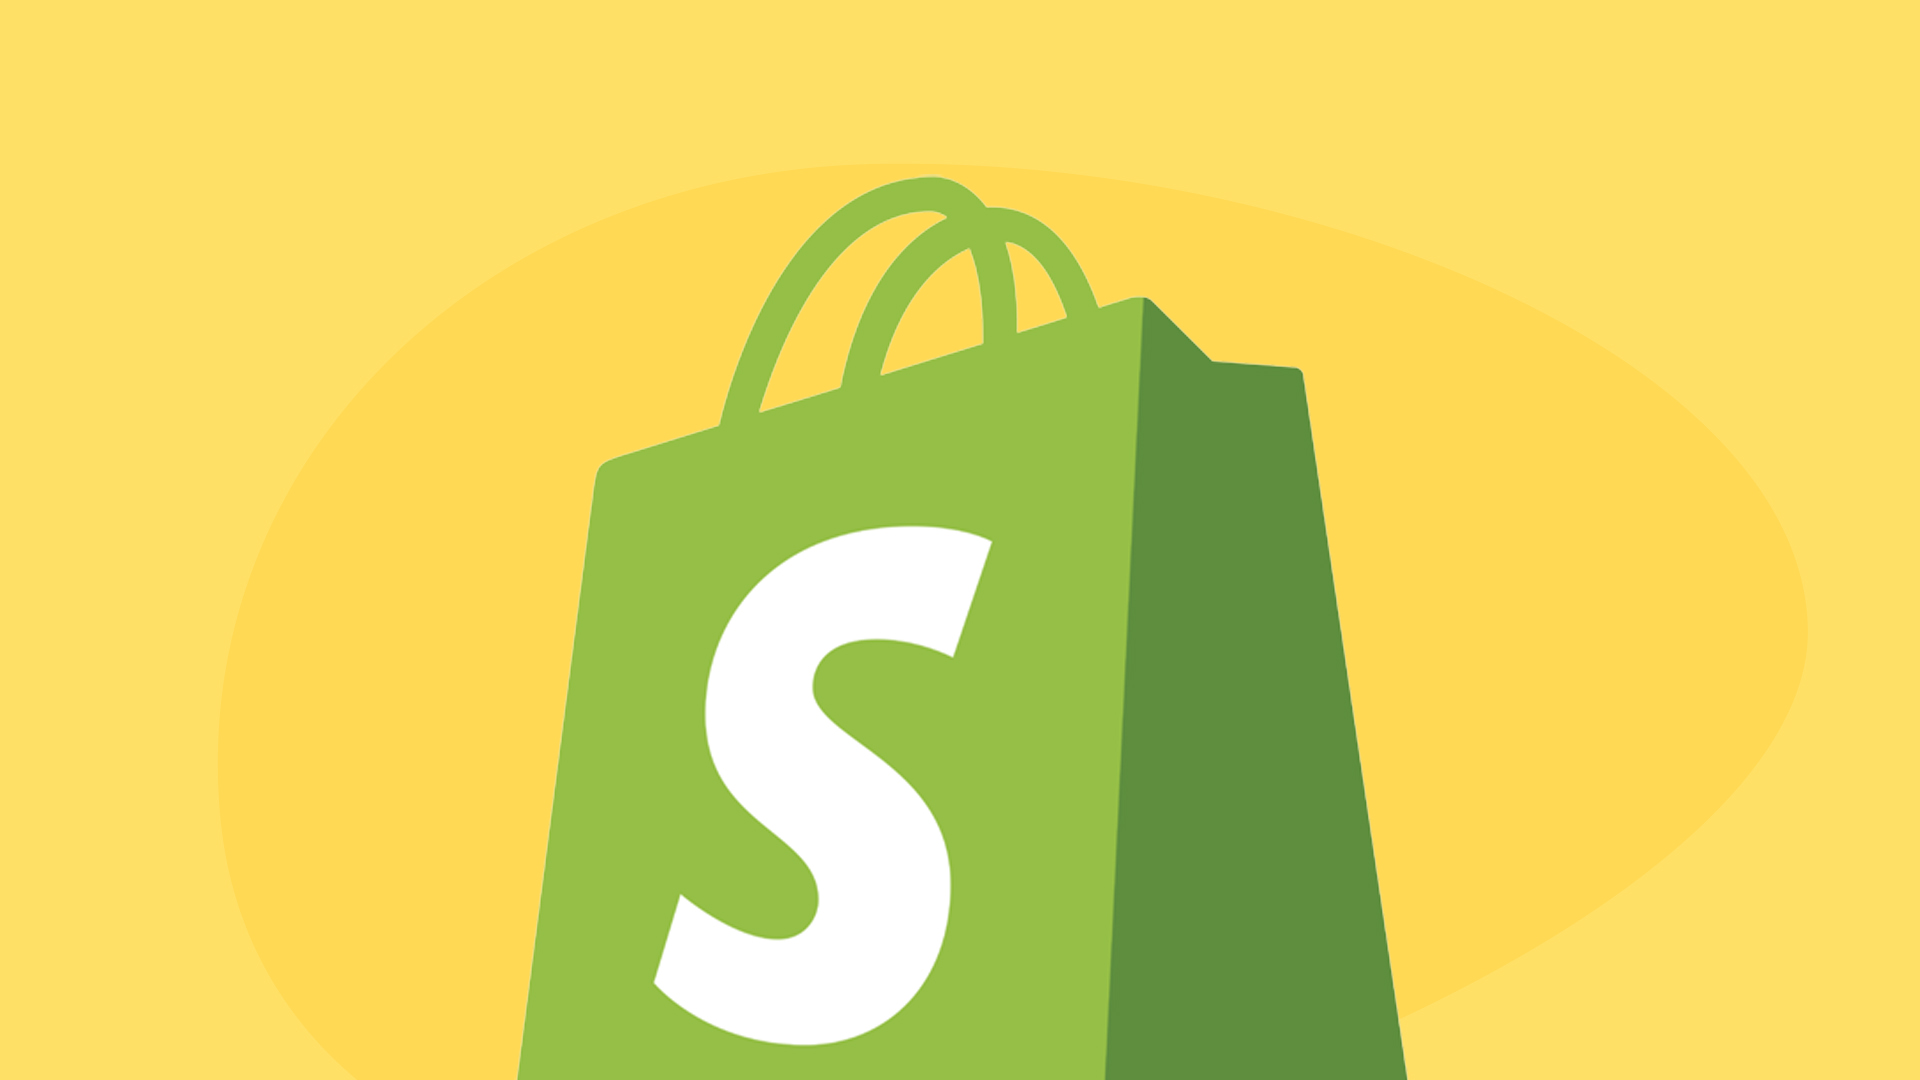 Shopify logo, company forensics